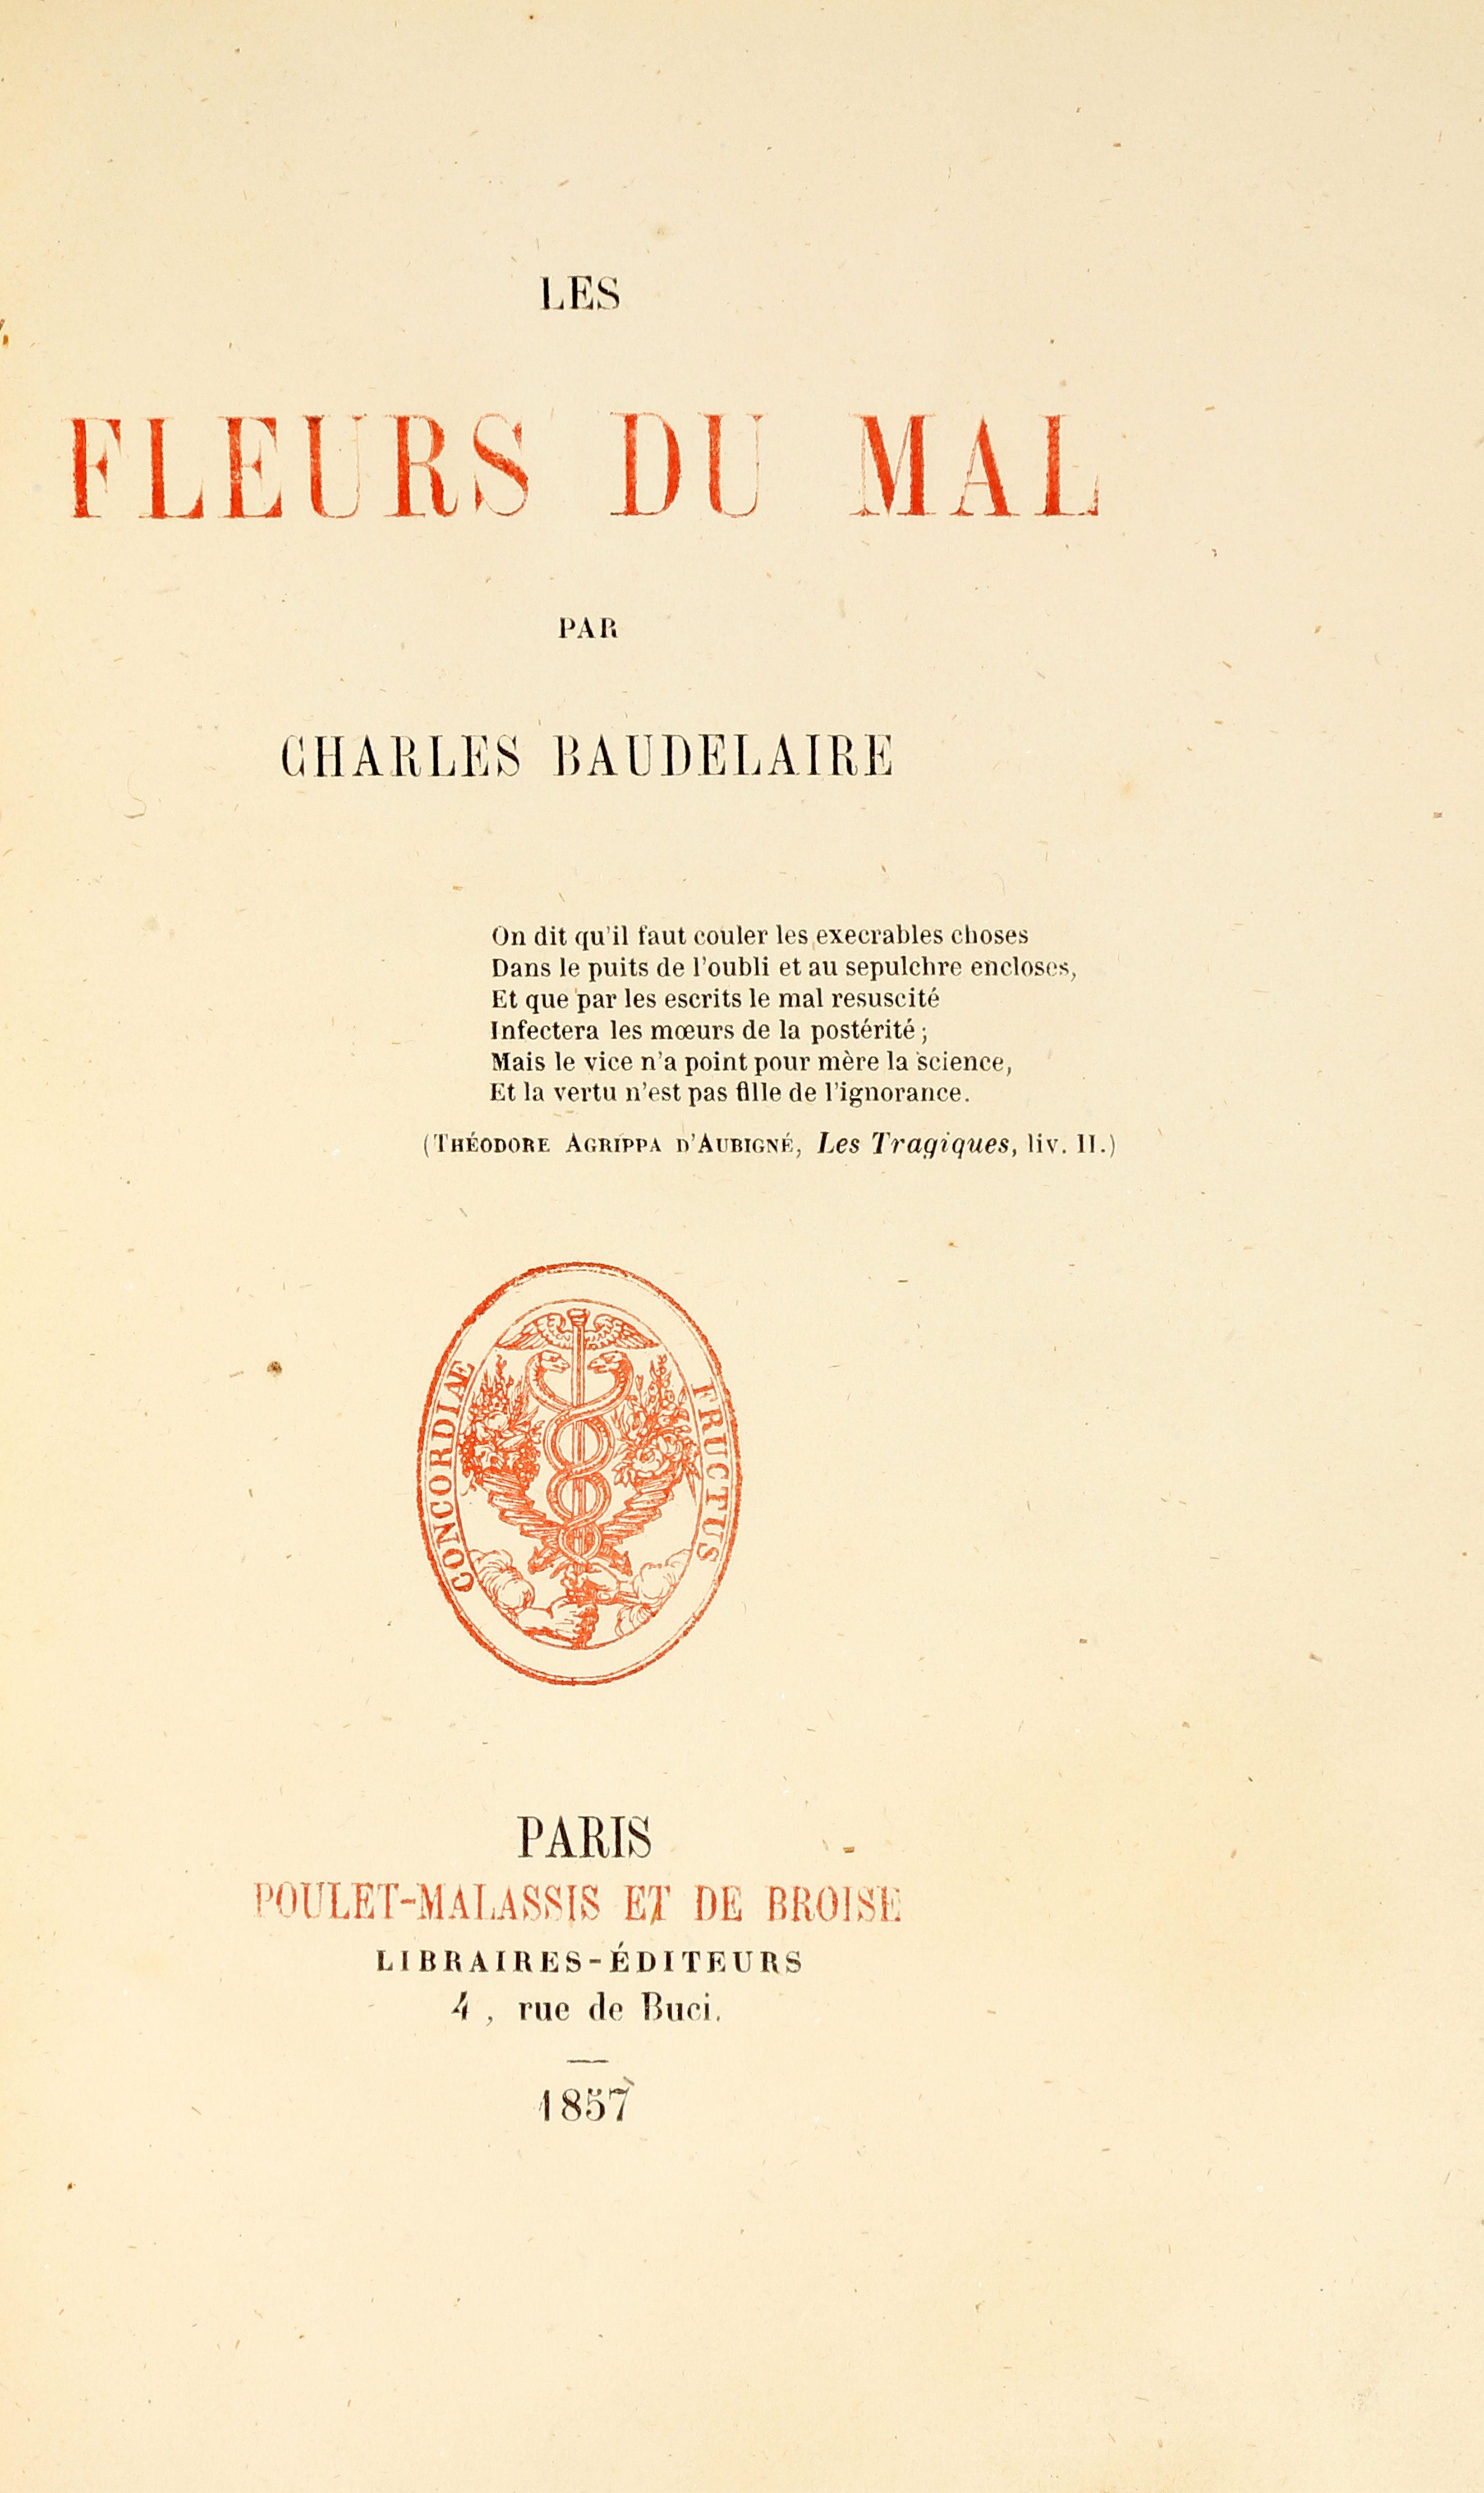 Charles Baudelaire Fleurs du Mal